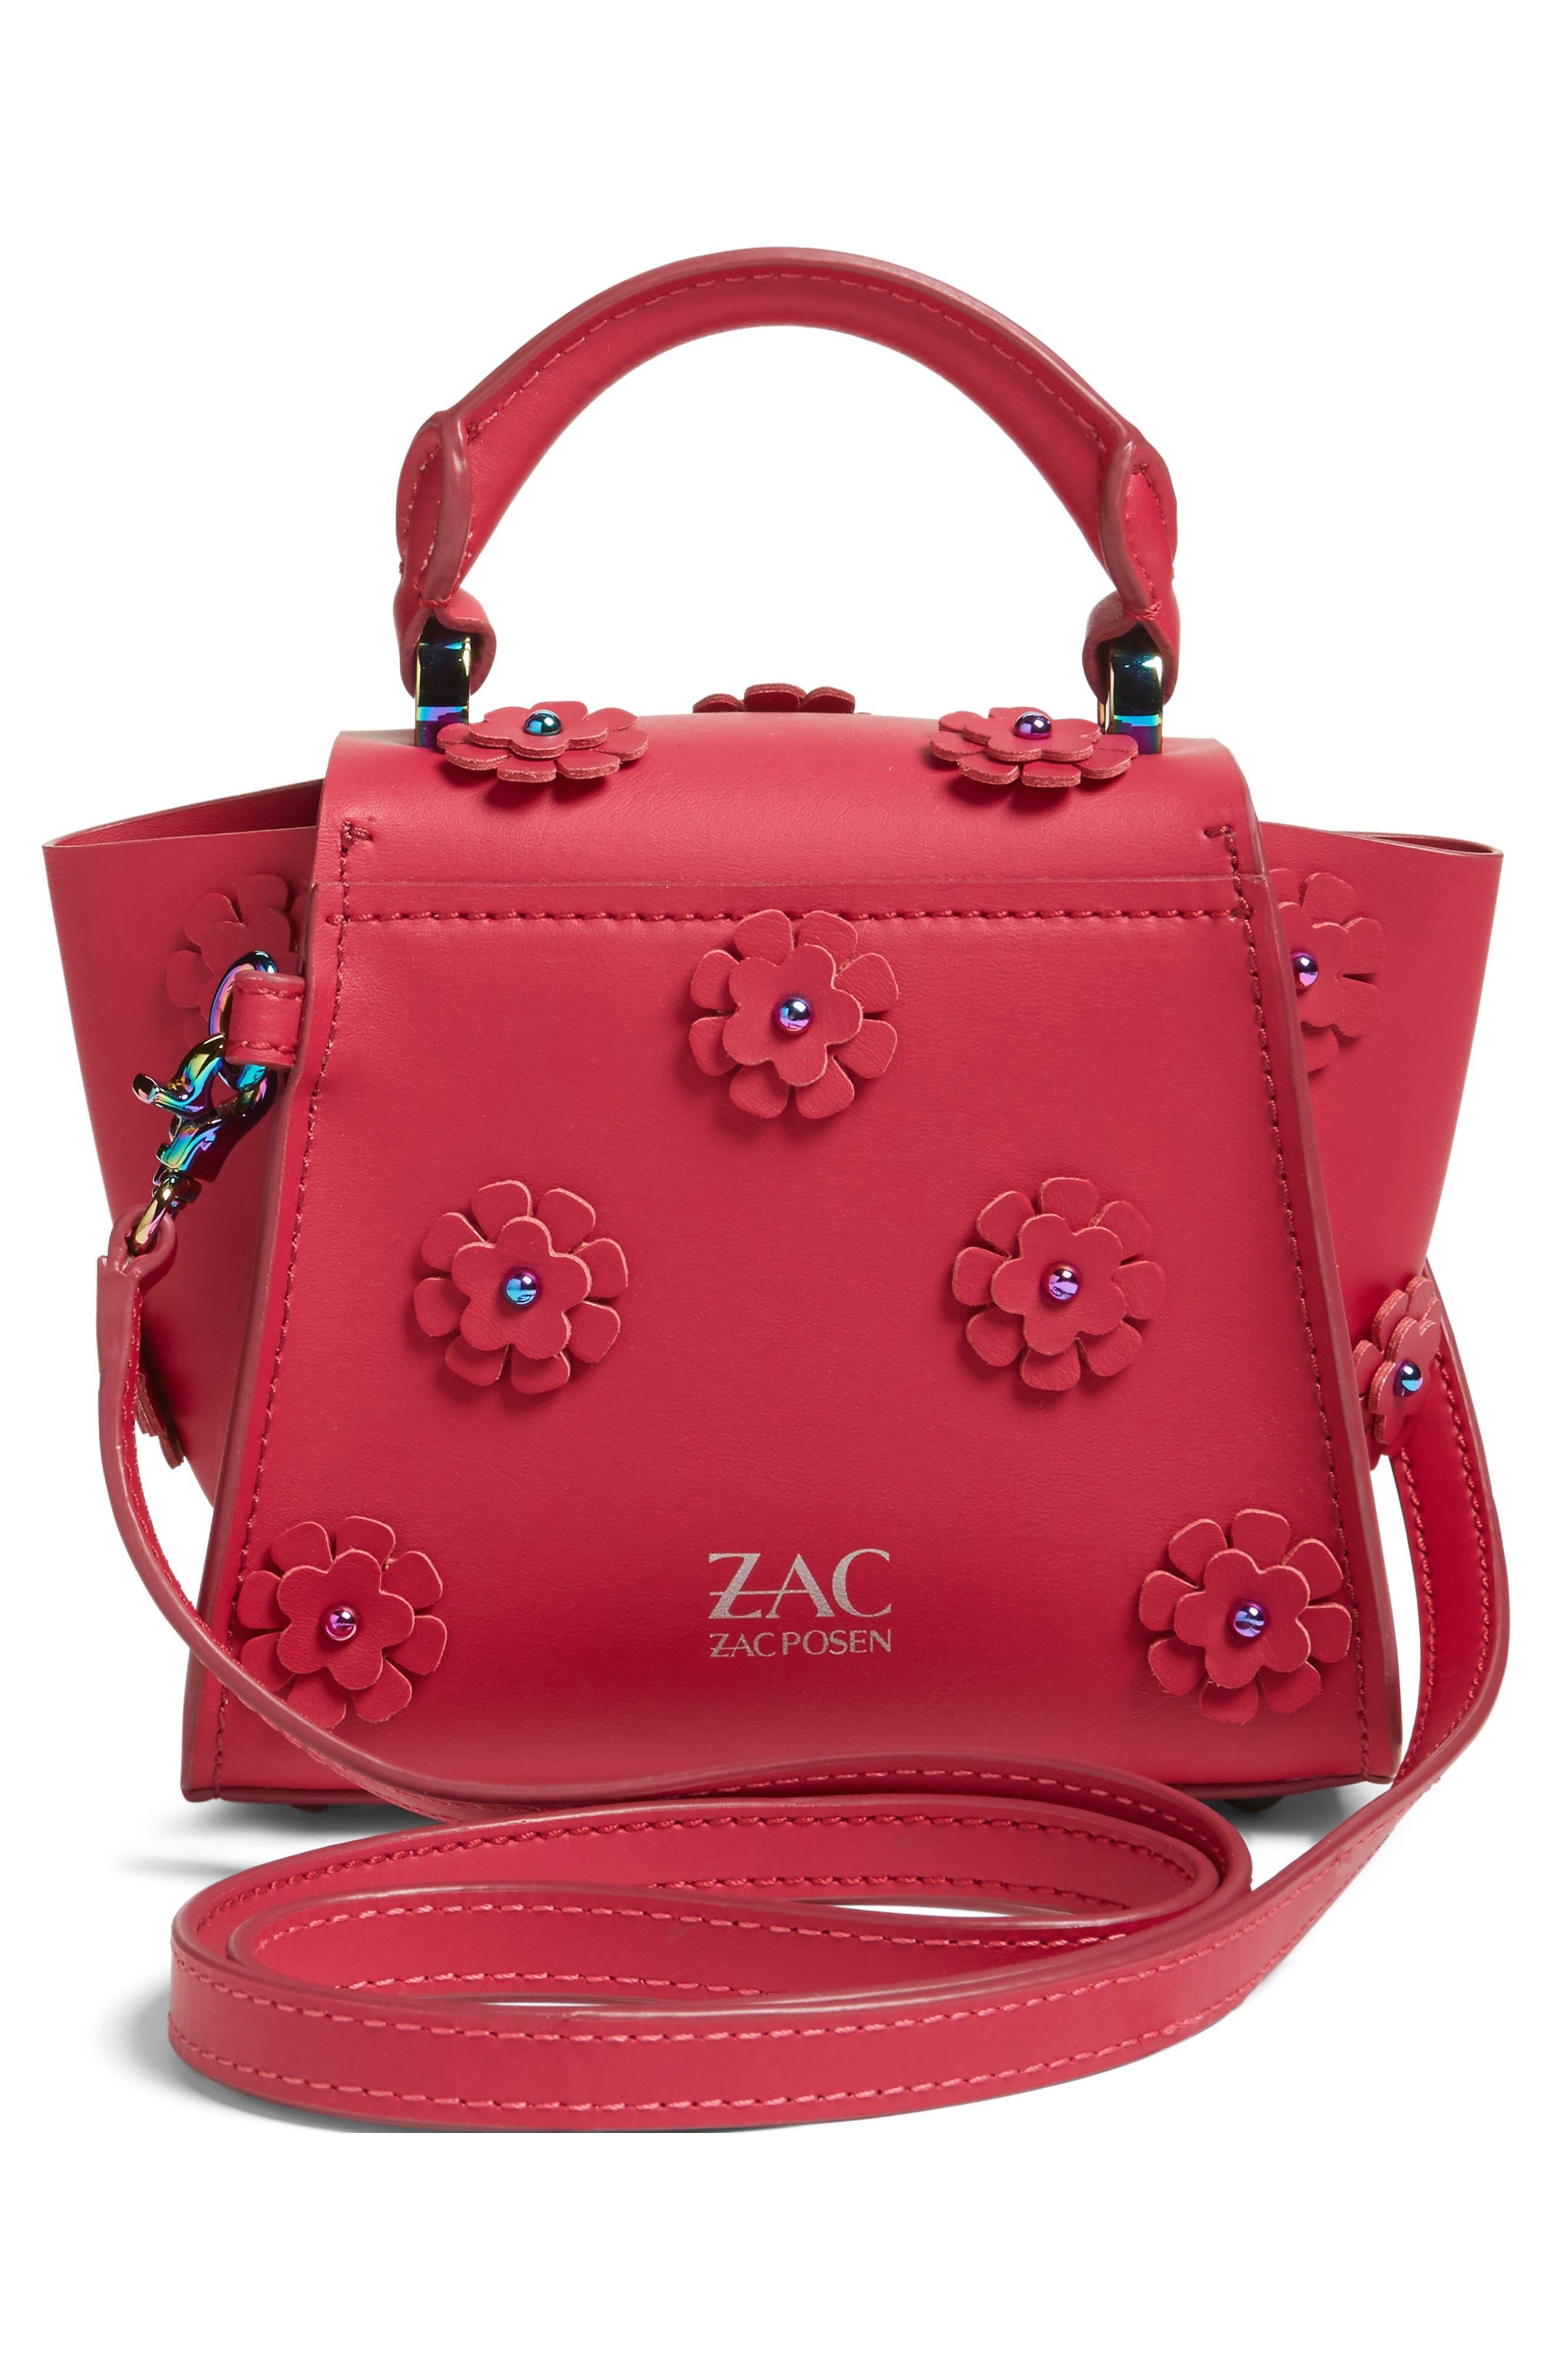 ZAC ZAC POSEN, Mini Eartha Iconic Top Handle Leather Satchel, Alternate thumbnail 2, color, 651